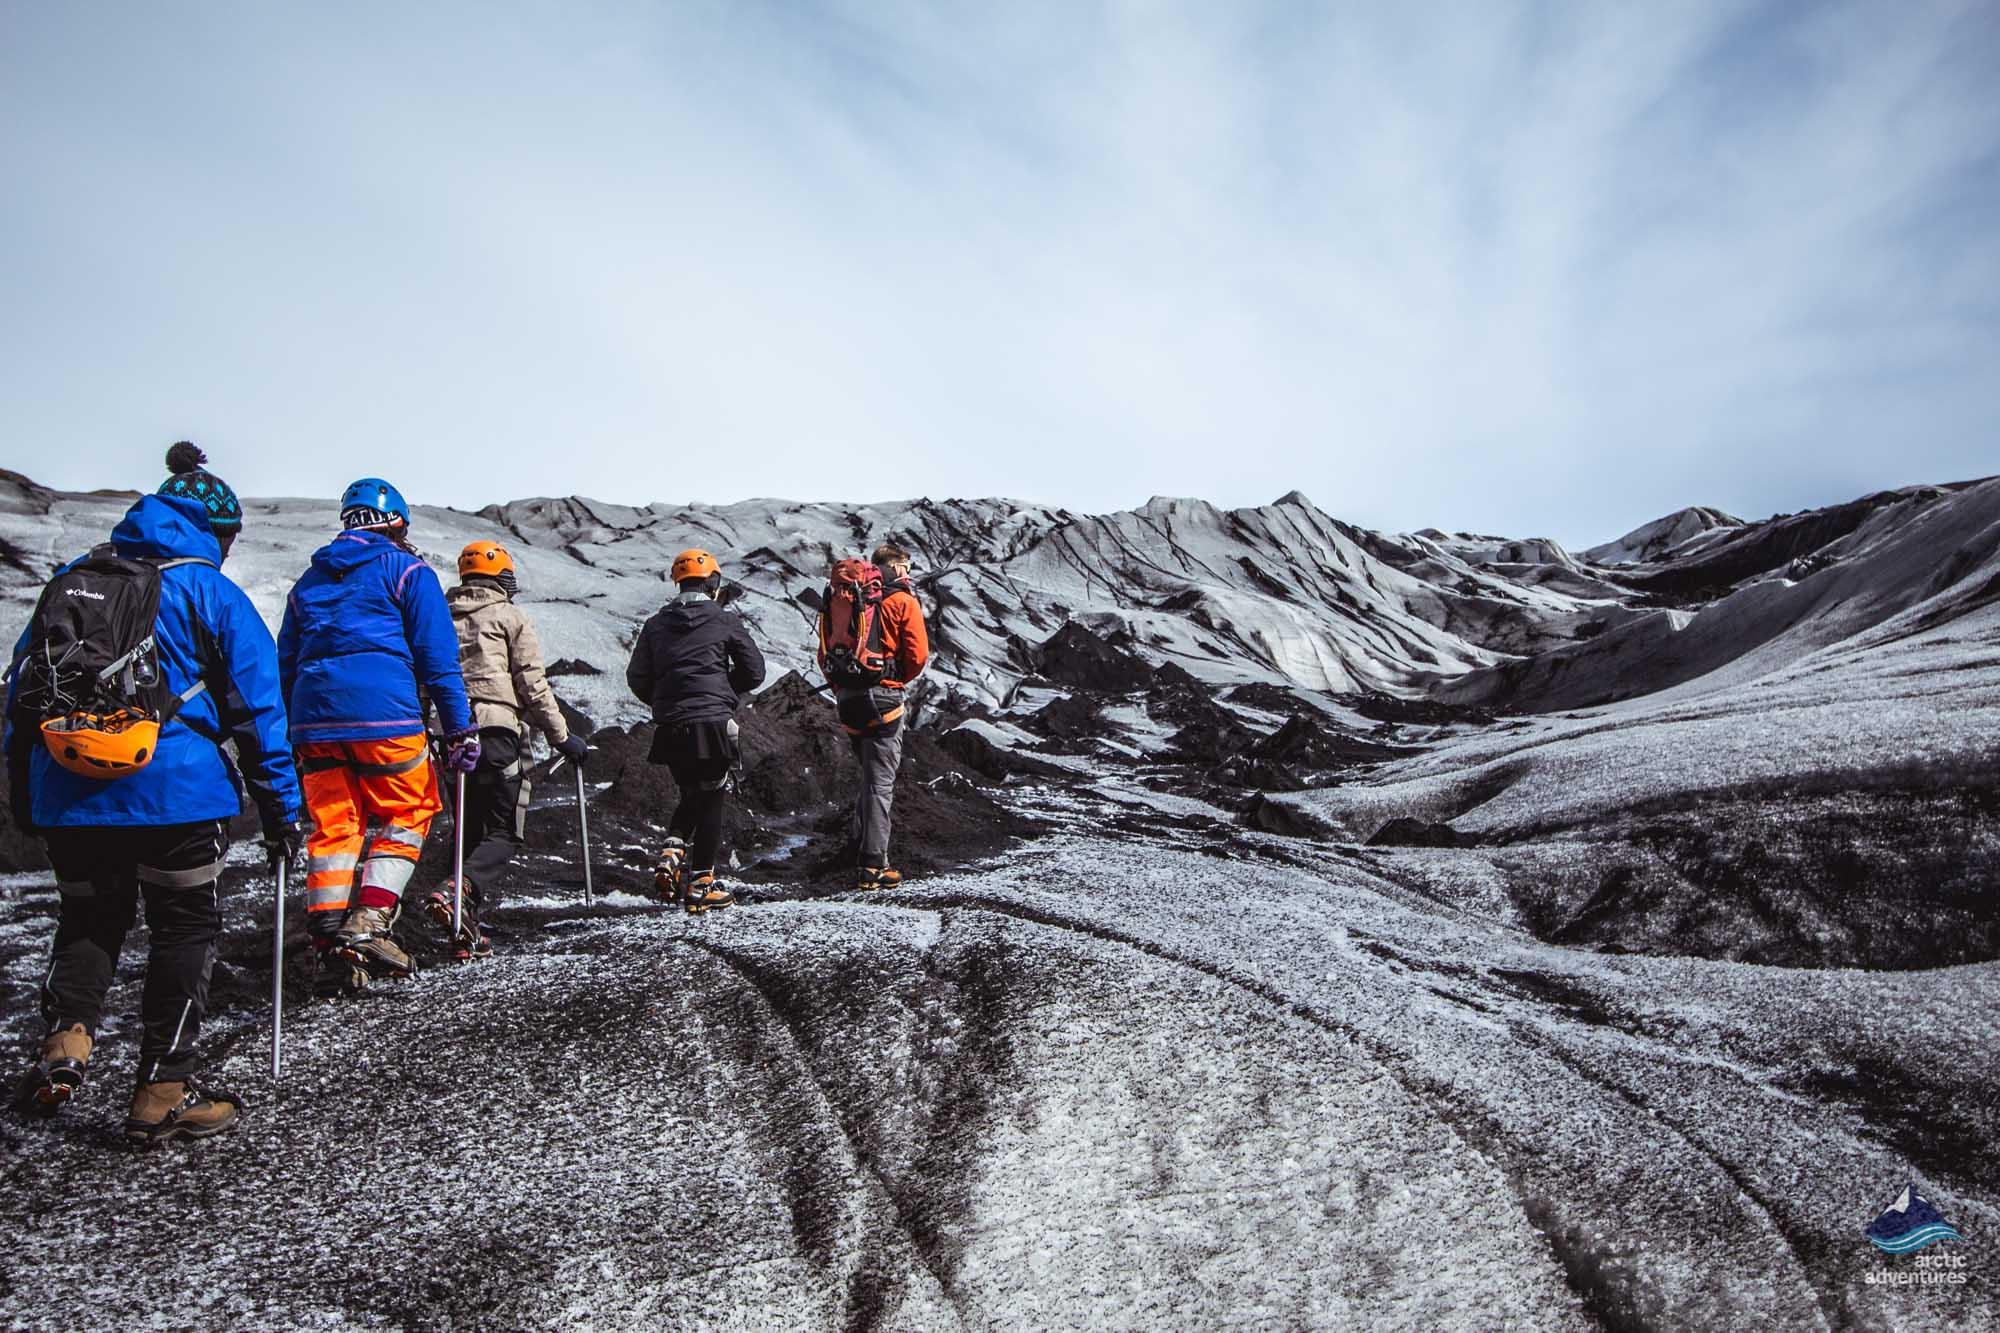 Glacier hiking on Solheimajokull Iceland